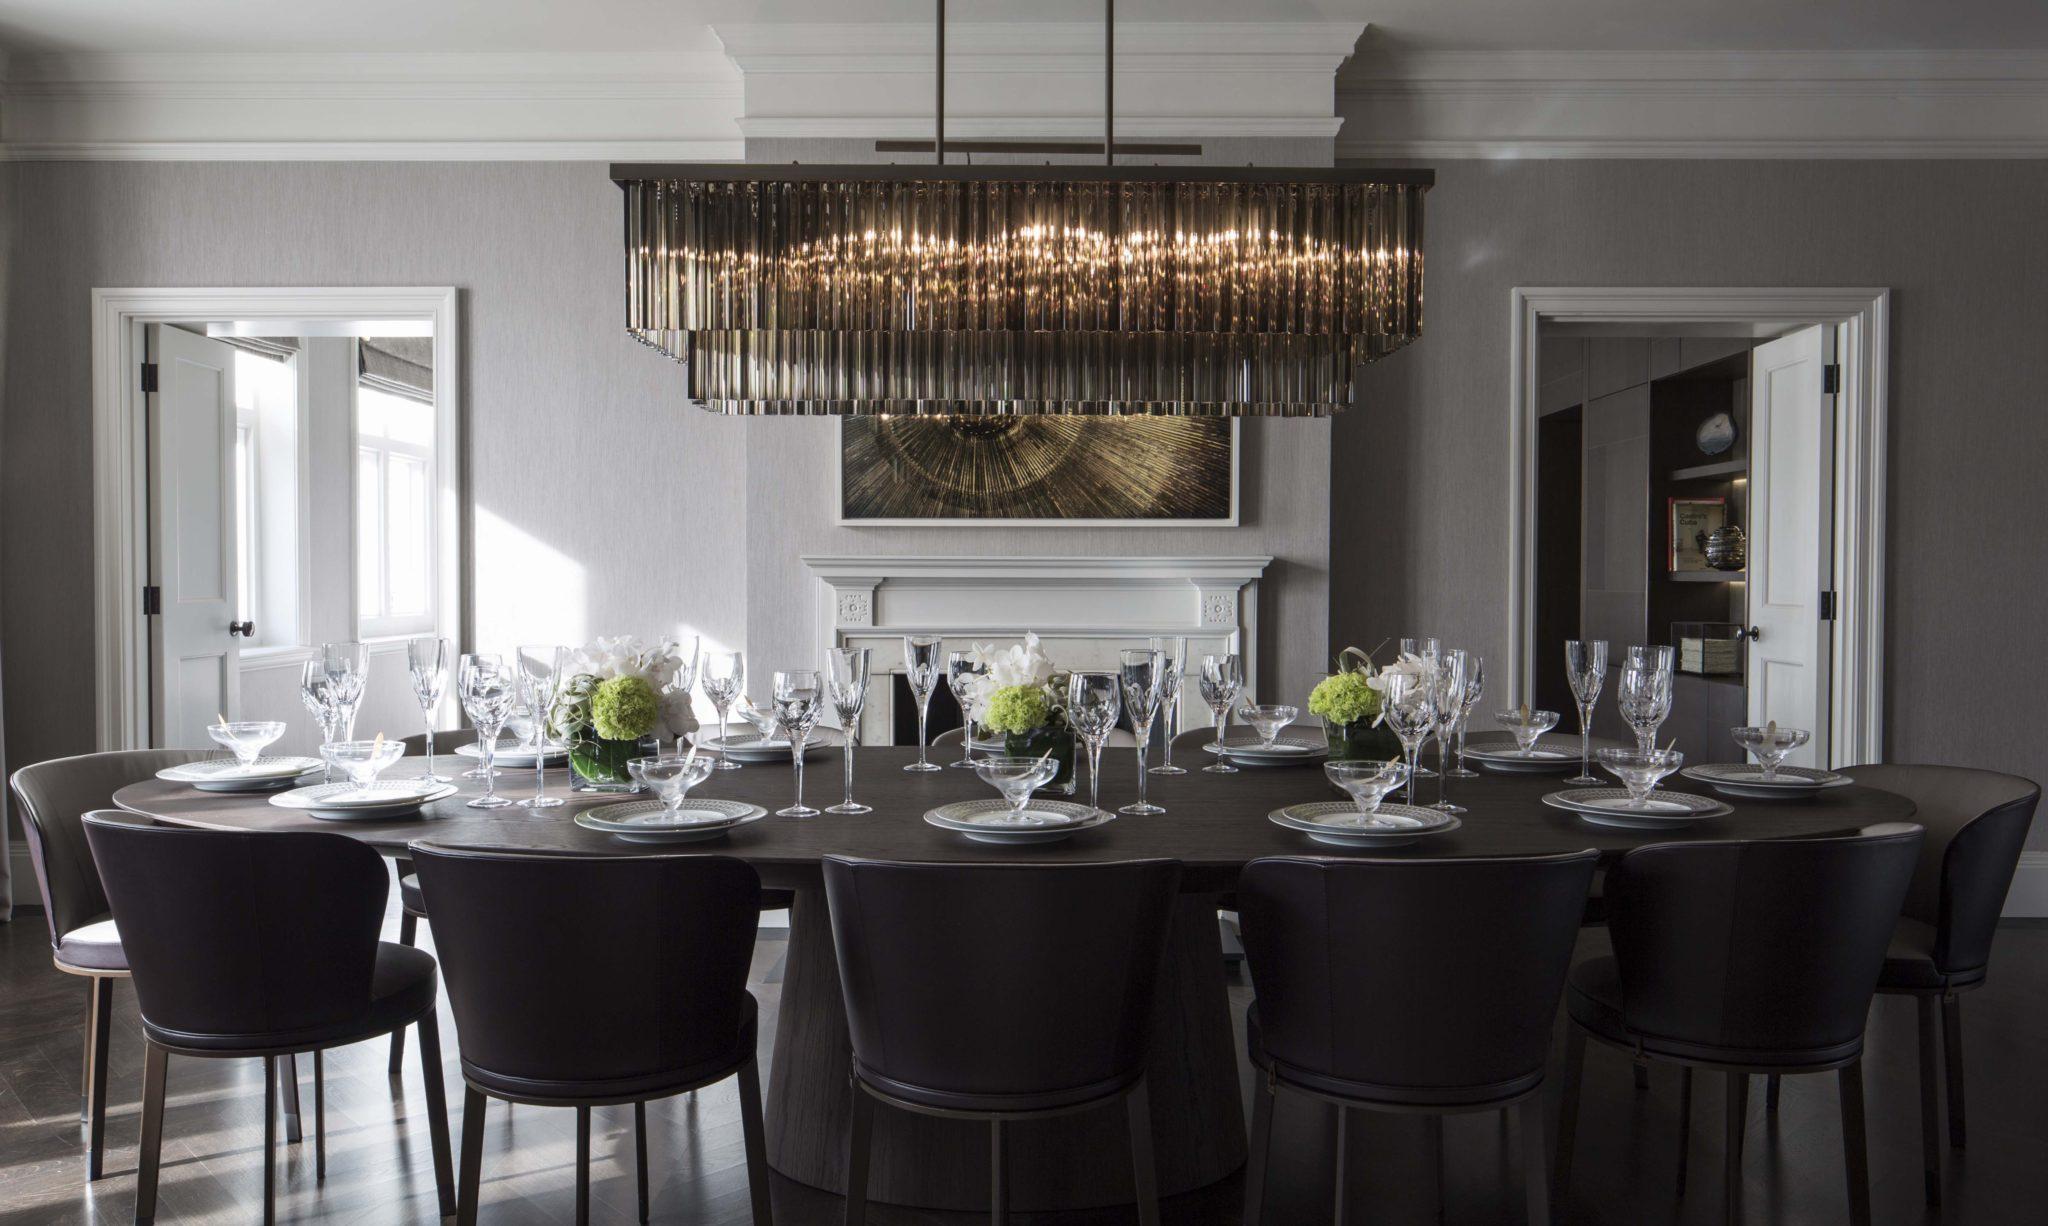 Knightsbridge Splendour - Dining room by Staffan Tollgard